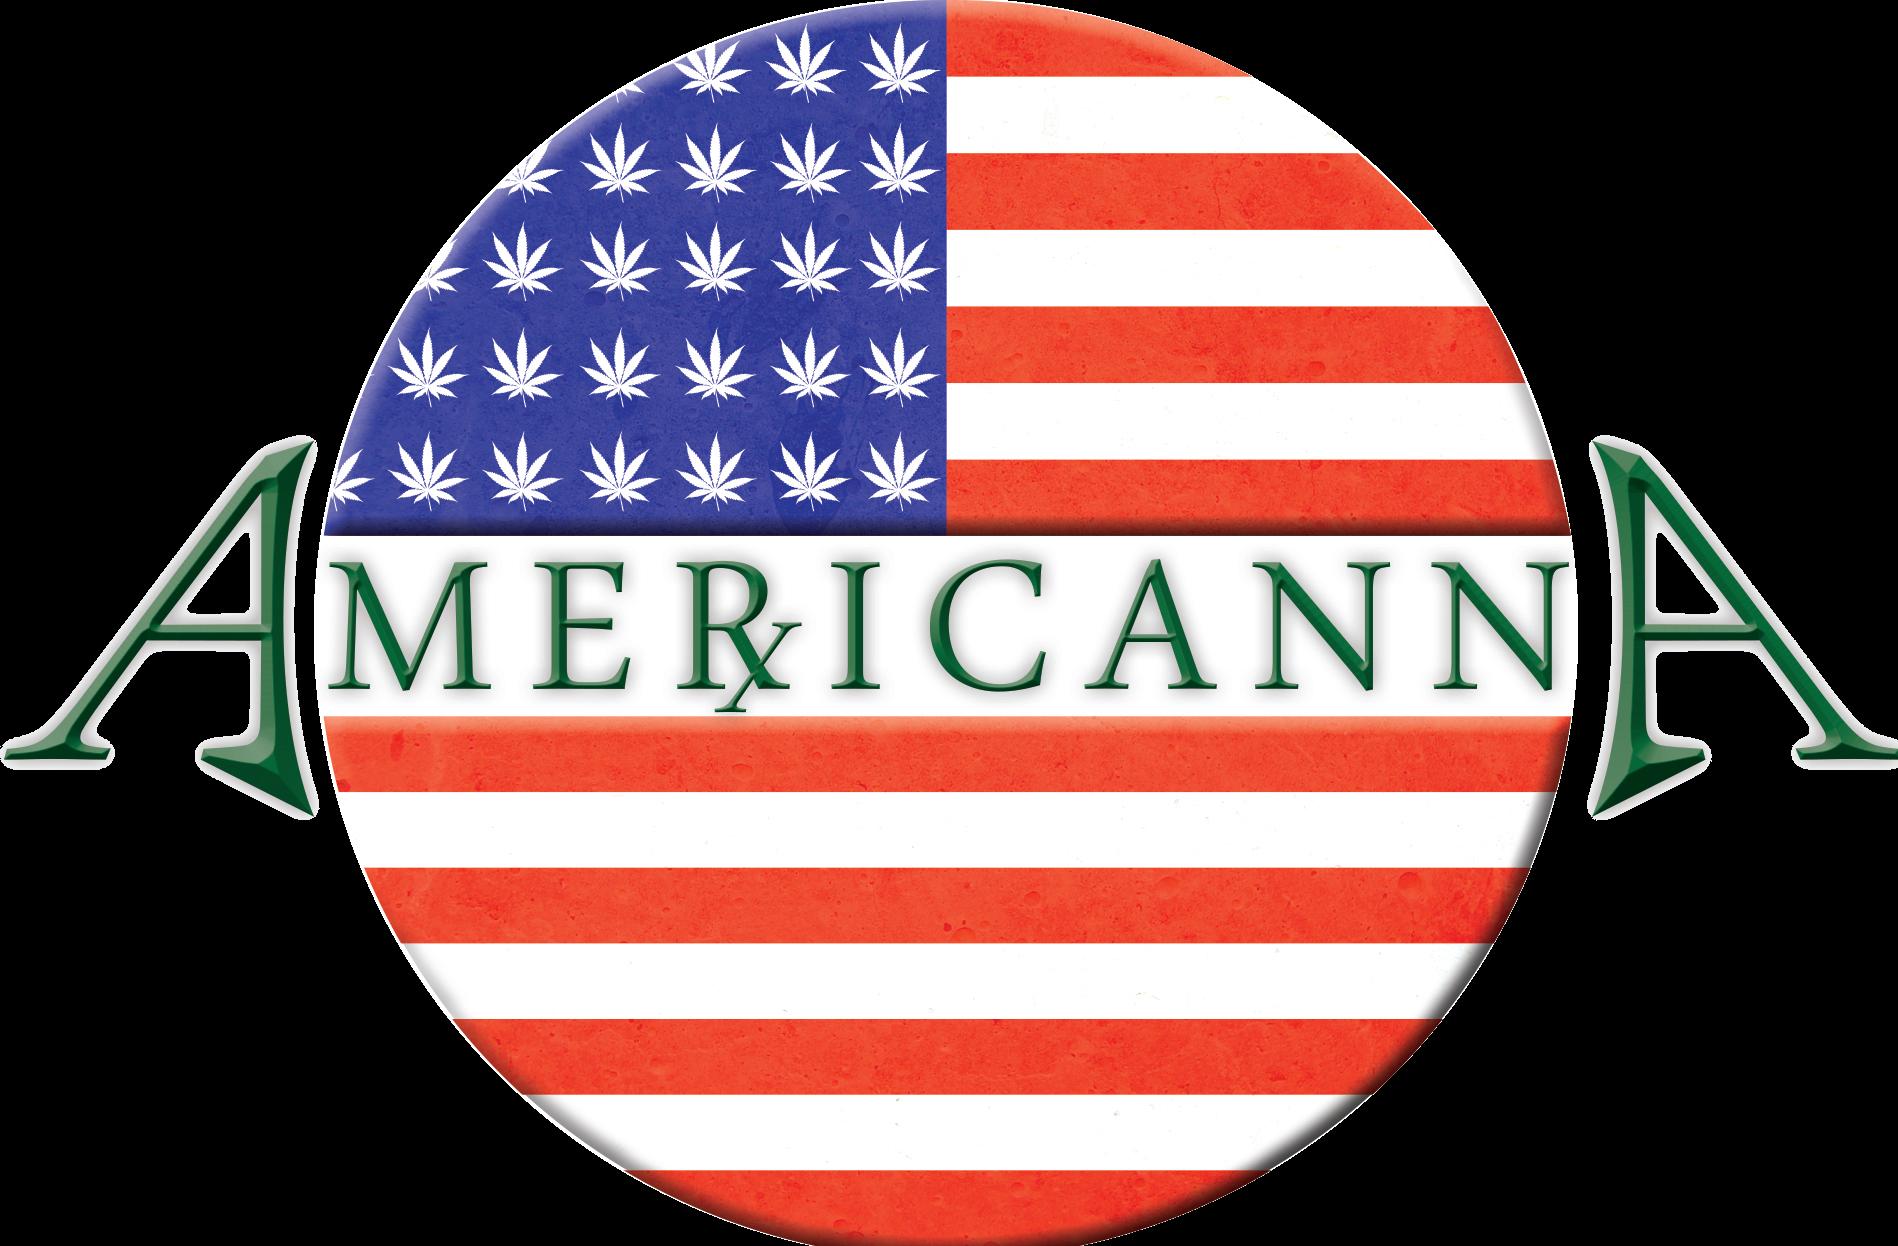 americanna_logo_transparent